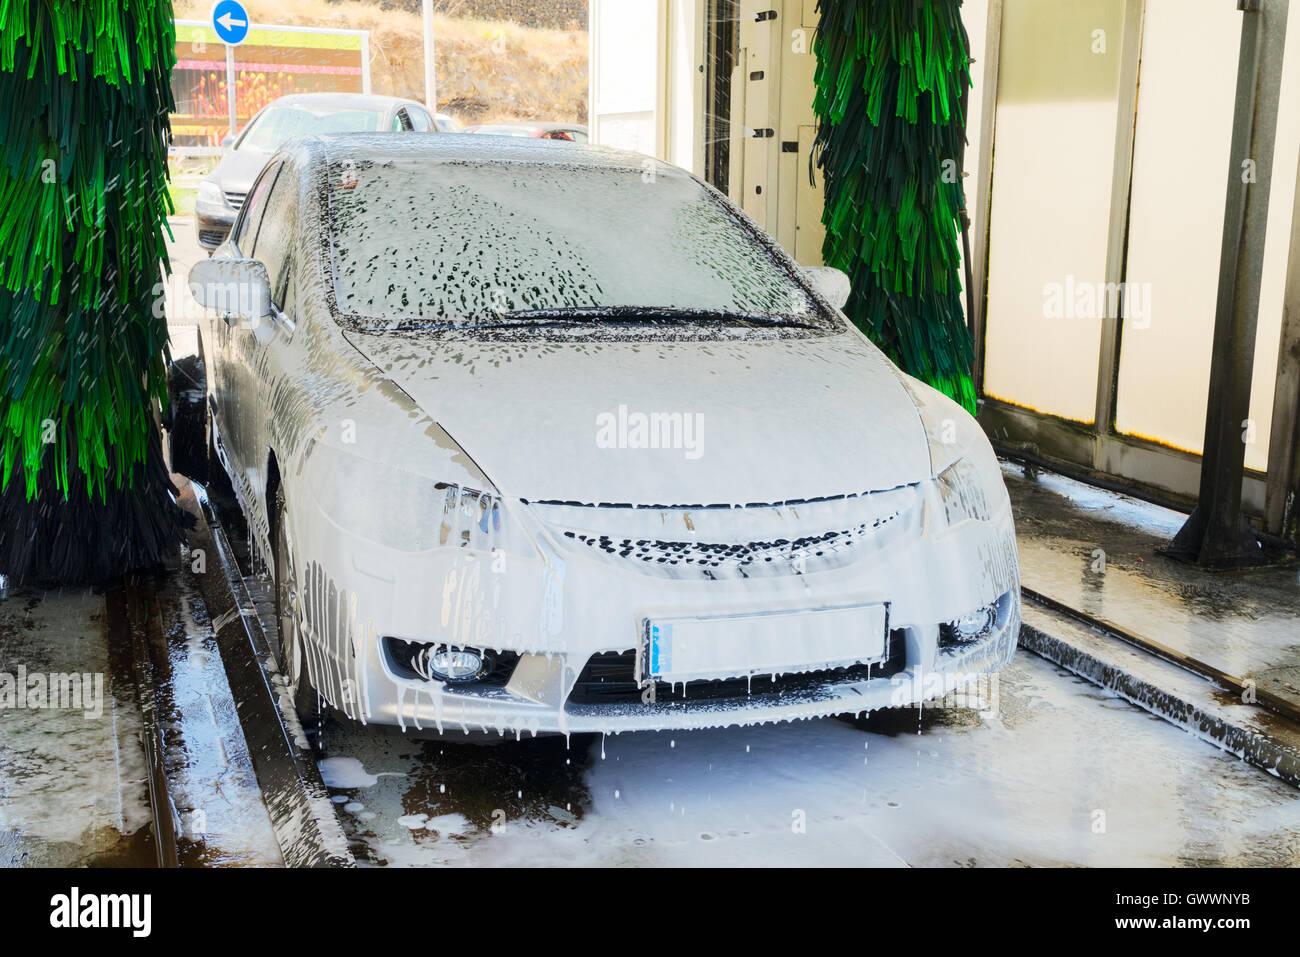 Washing gray car - Stock Image